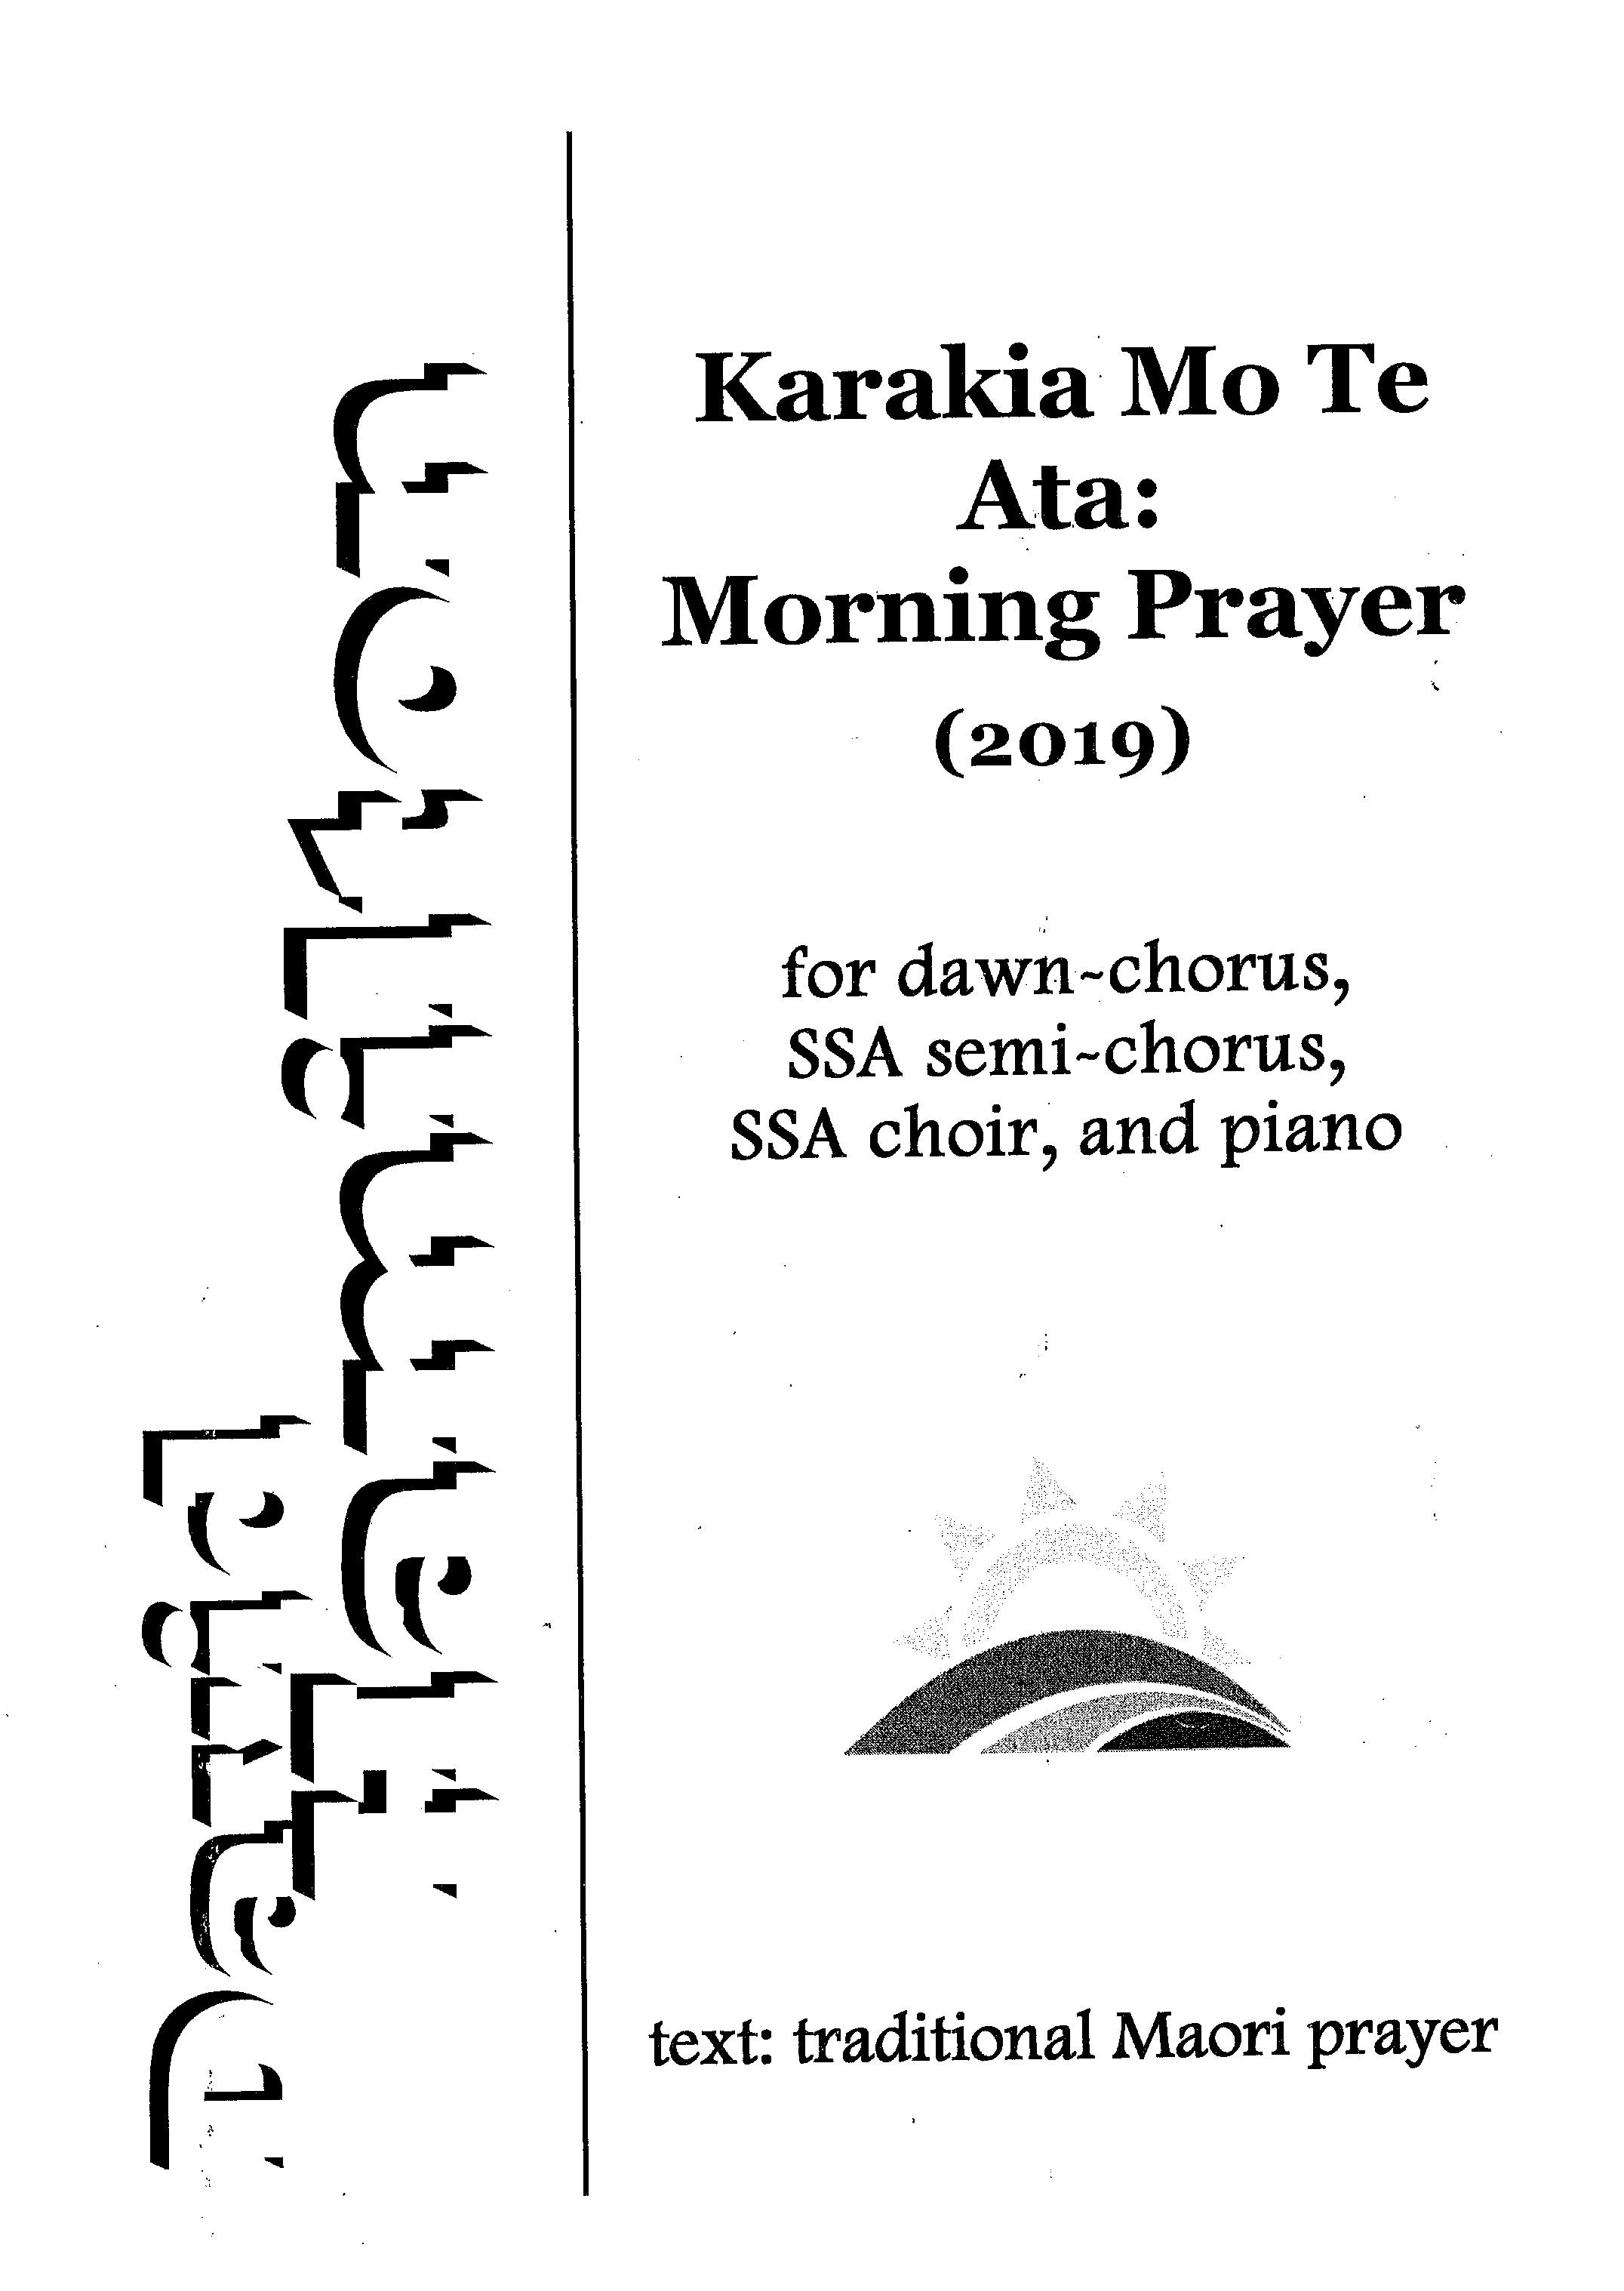 David Hamilton: Karakia Mo Te Ata: Morning Prayer - hardcopy SCORE